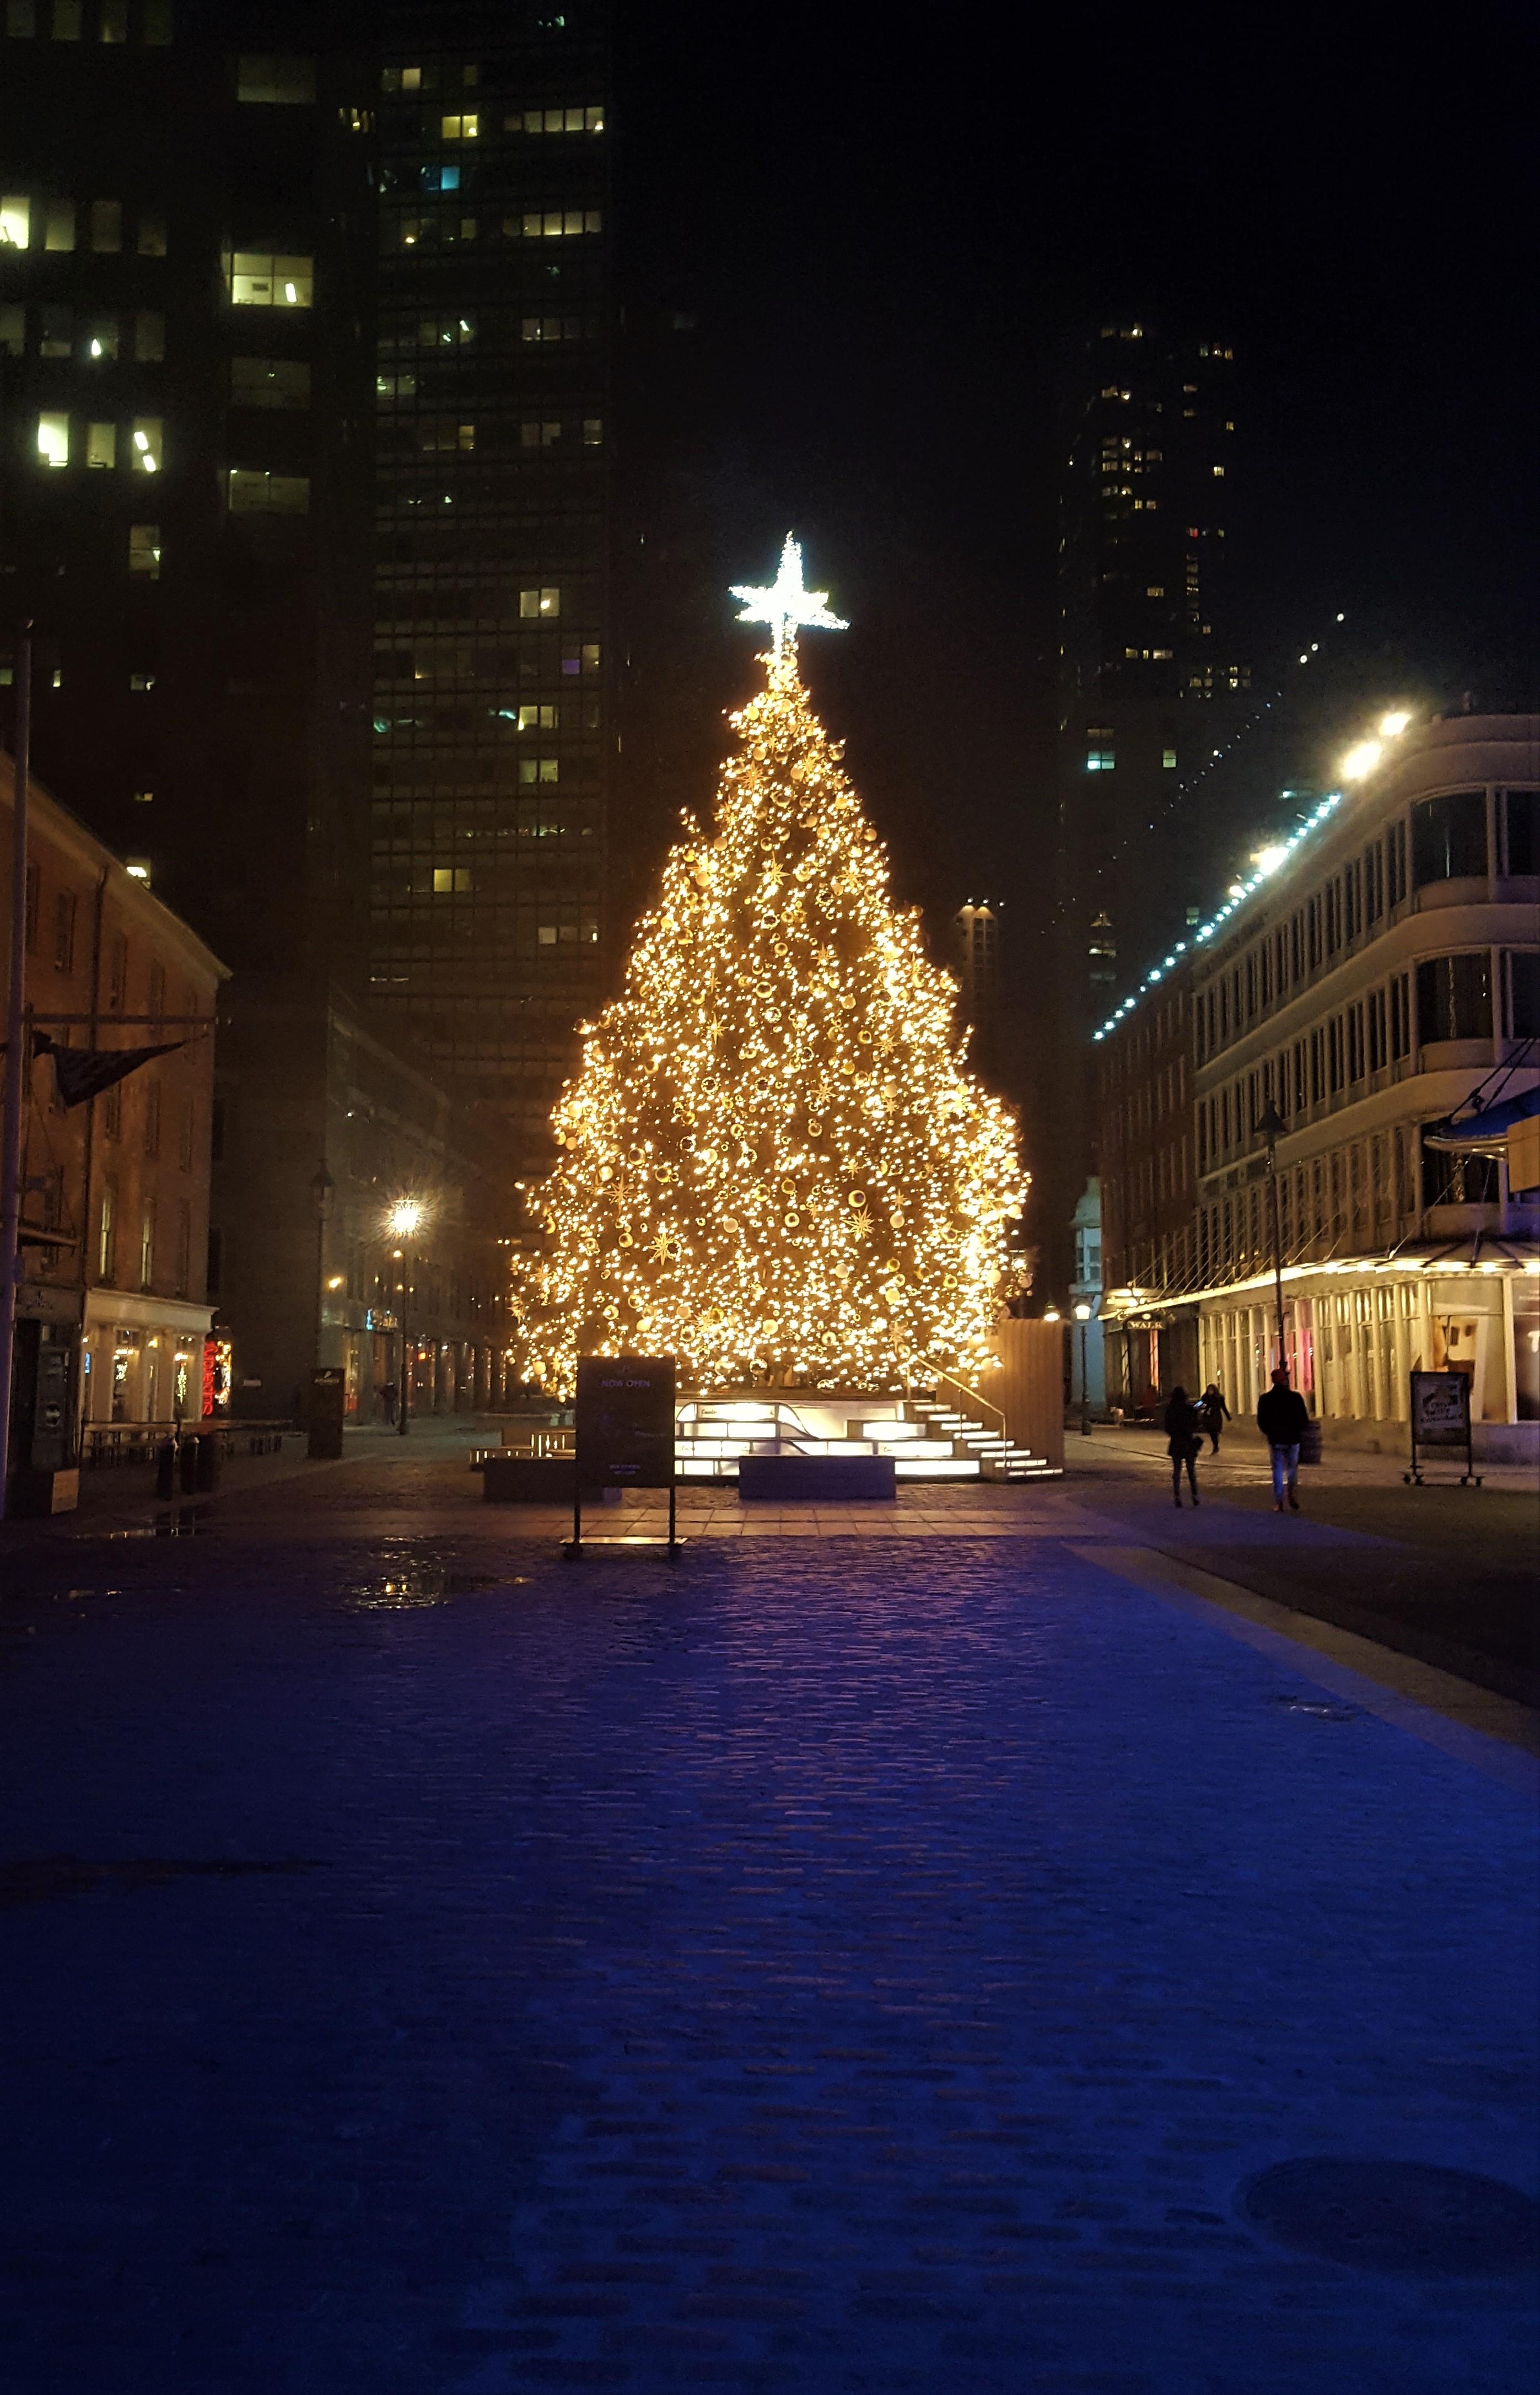 filechristmas tree on fulton st in manhattan at nightjpg